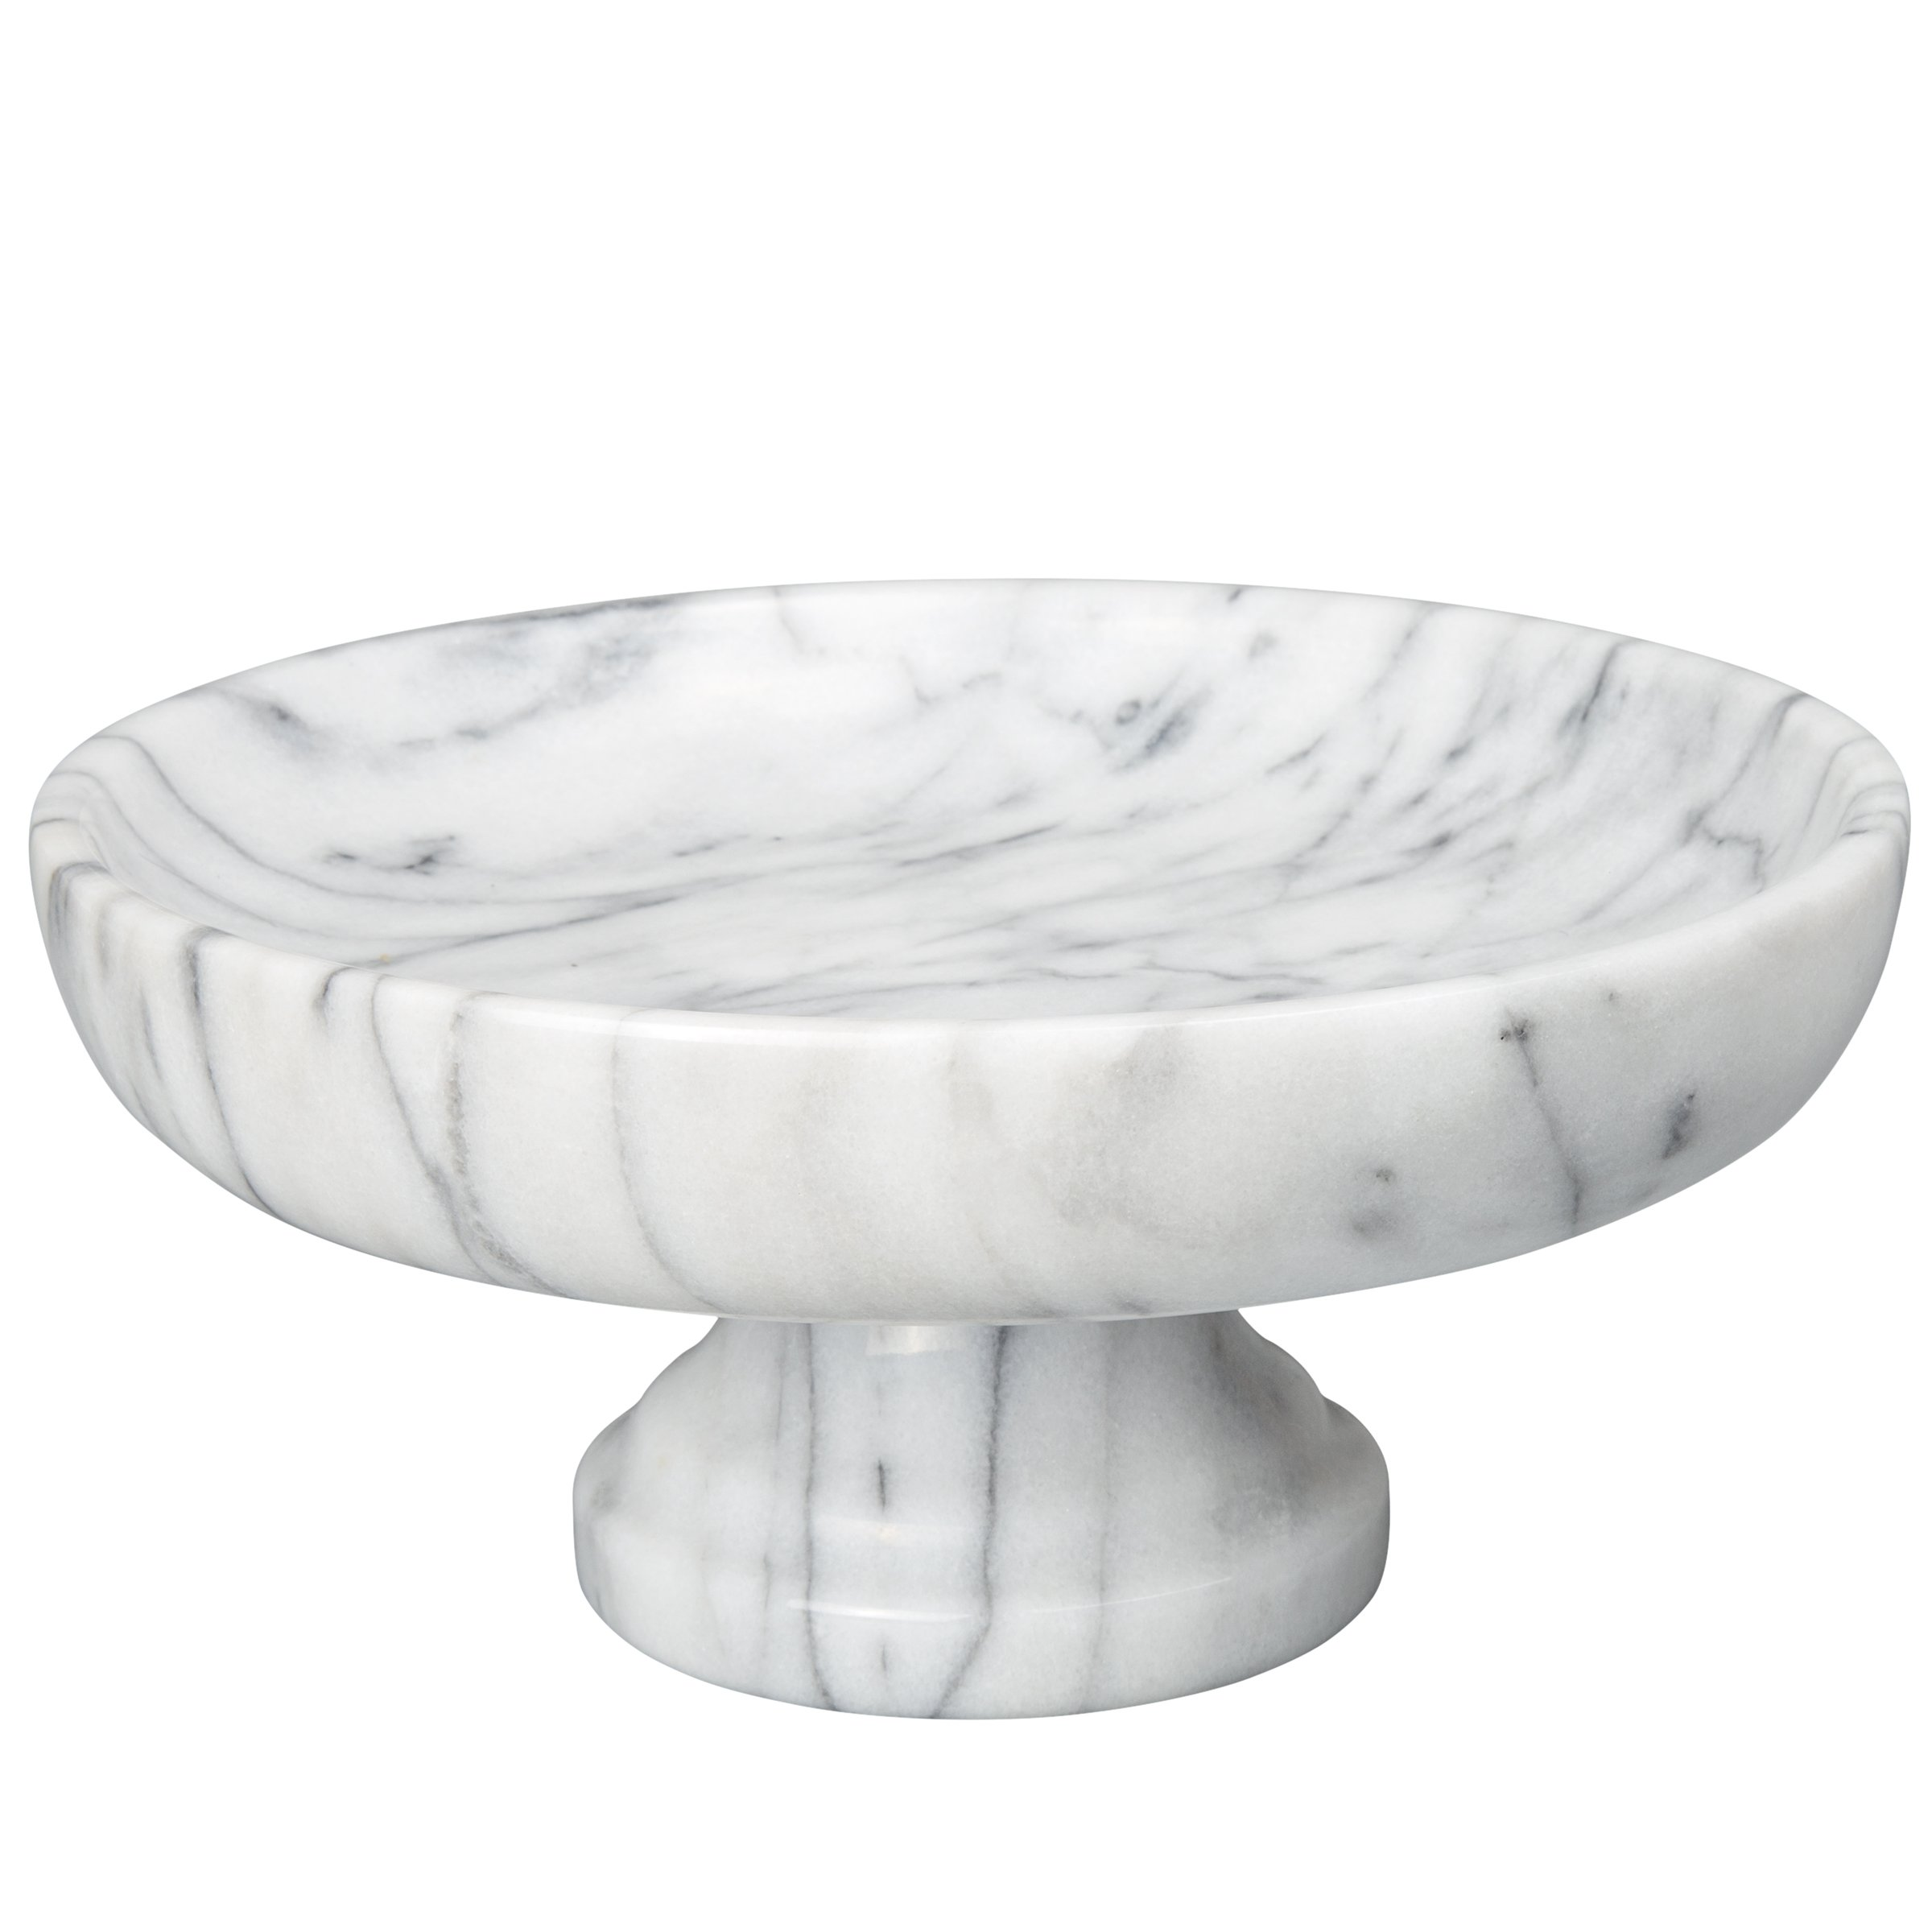 Creative Home Marble Fruit Bowl on Pedestal, 10'' x 10'', White